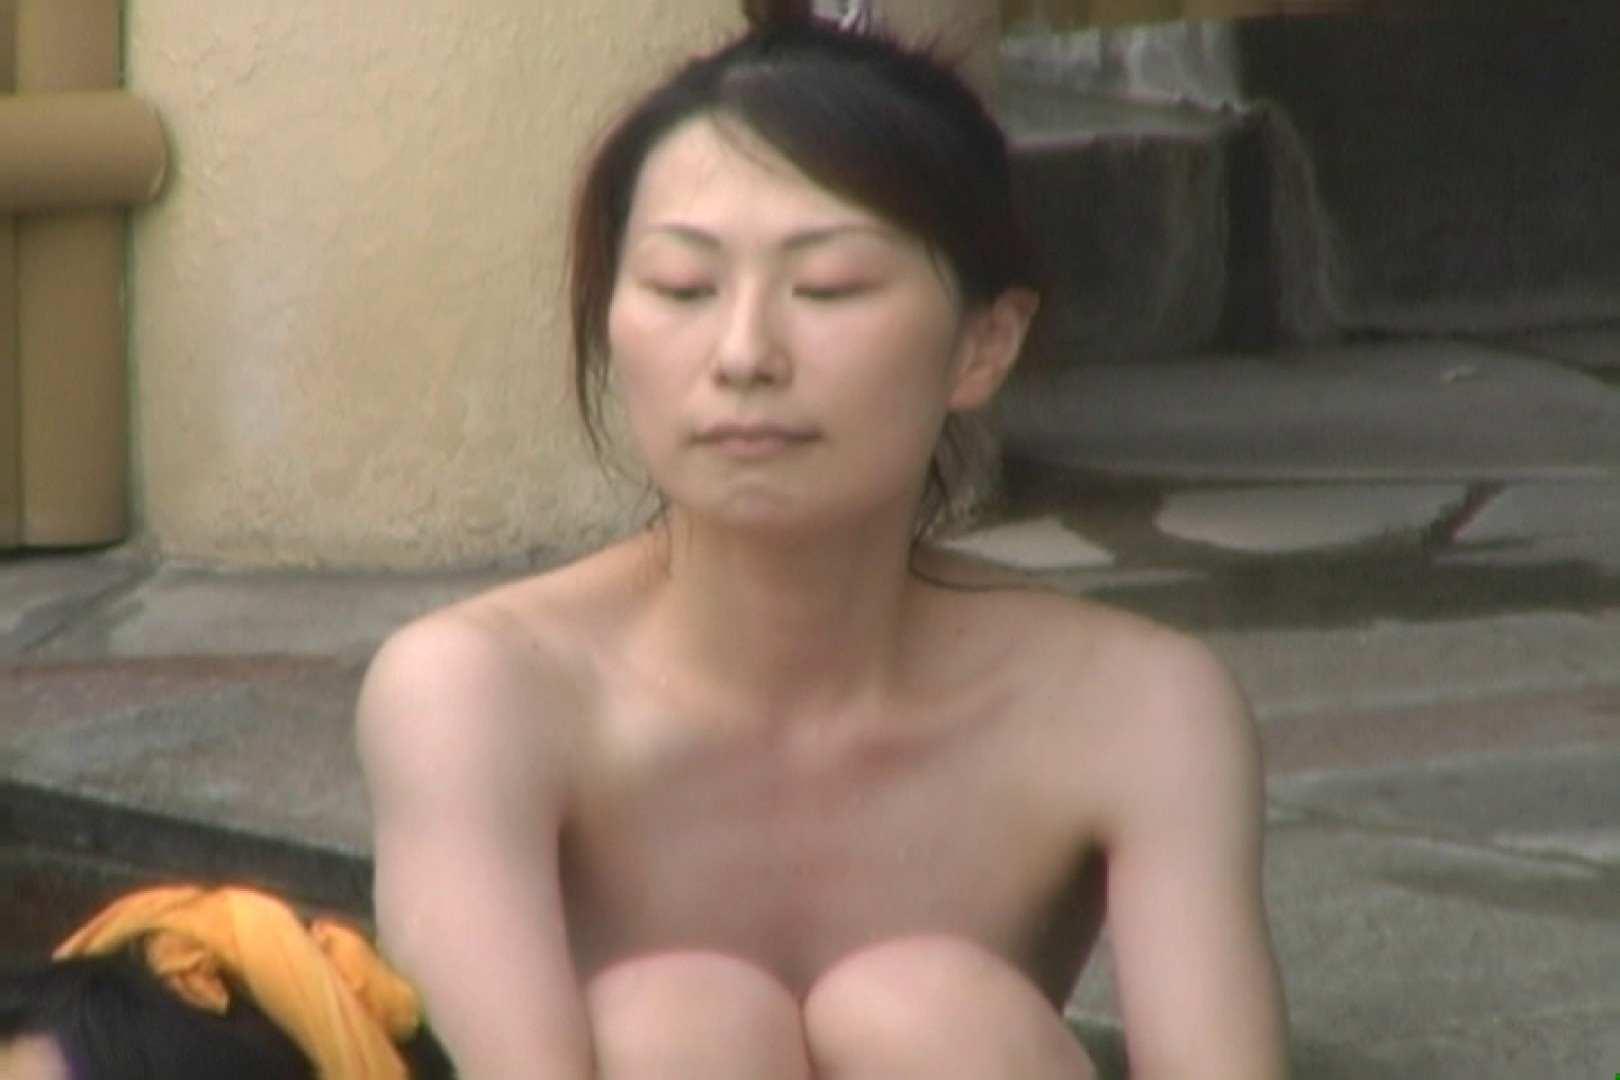 Aquaな露天風呂Vol.615 0  36連発 6